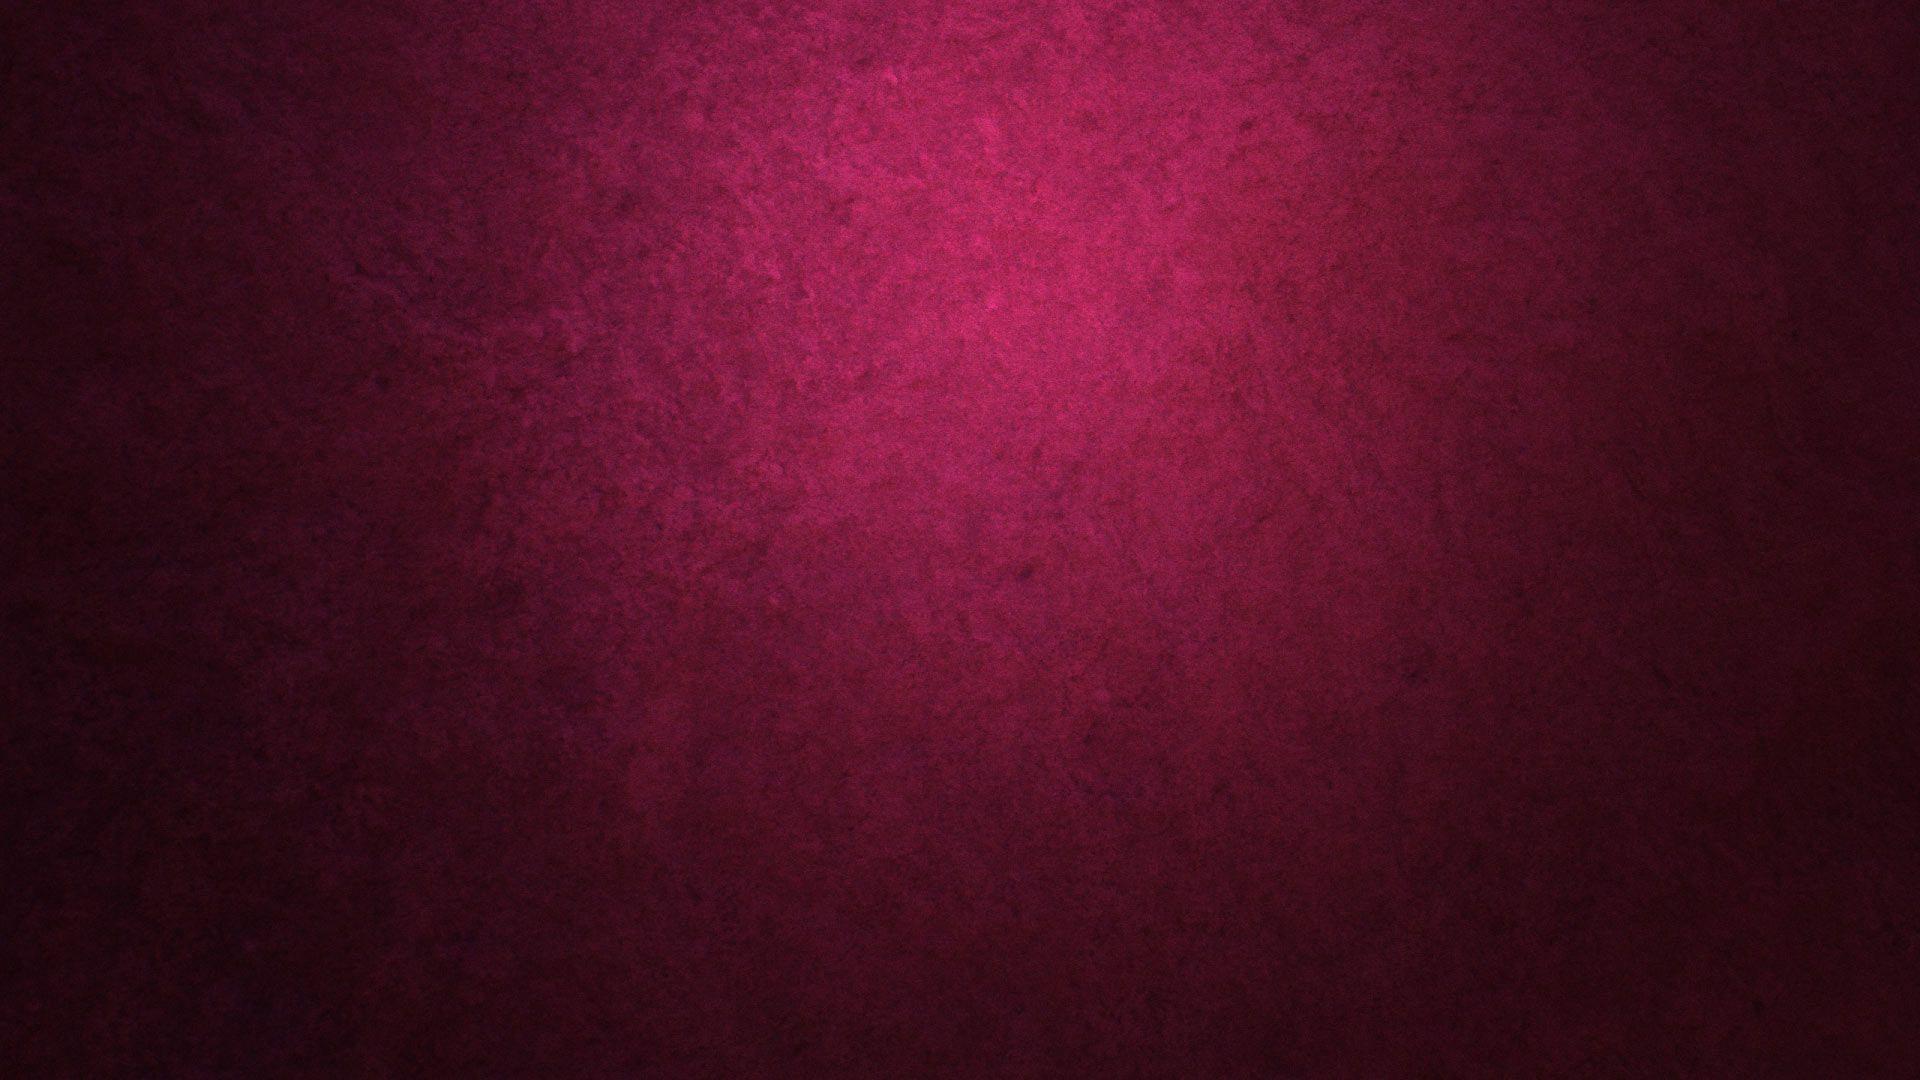 Burgundy PC Wallpaper